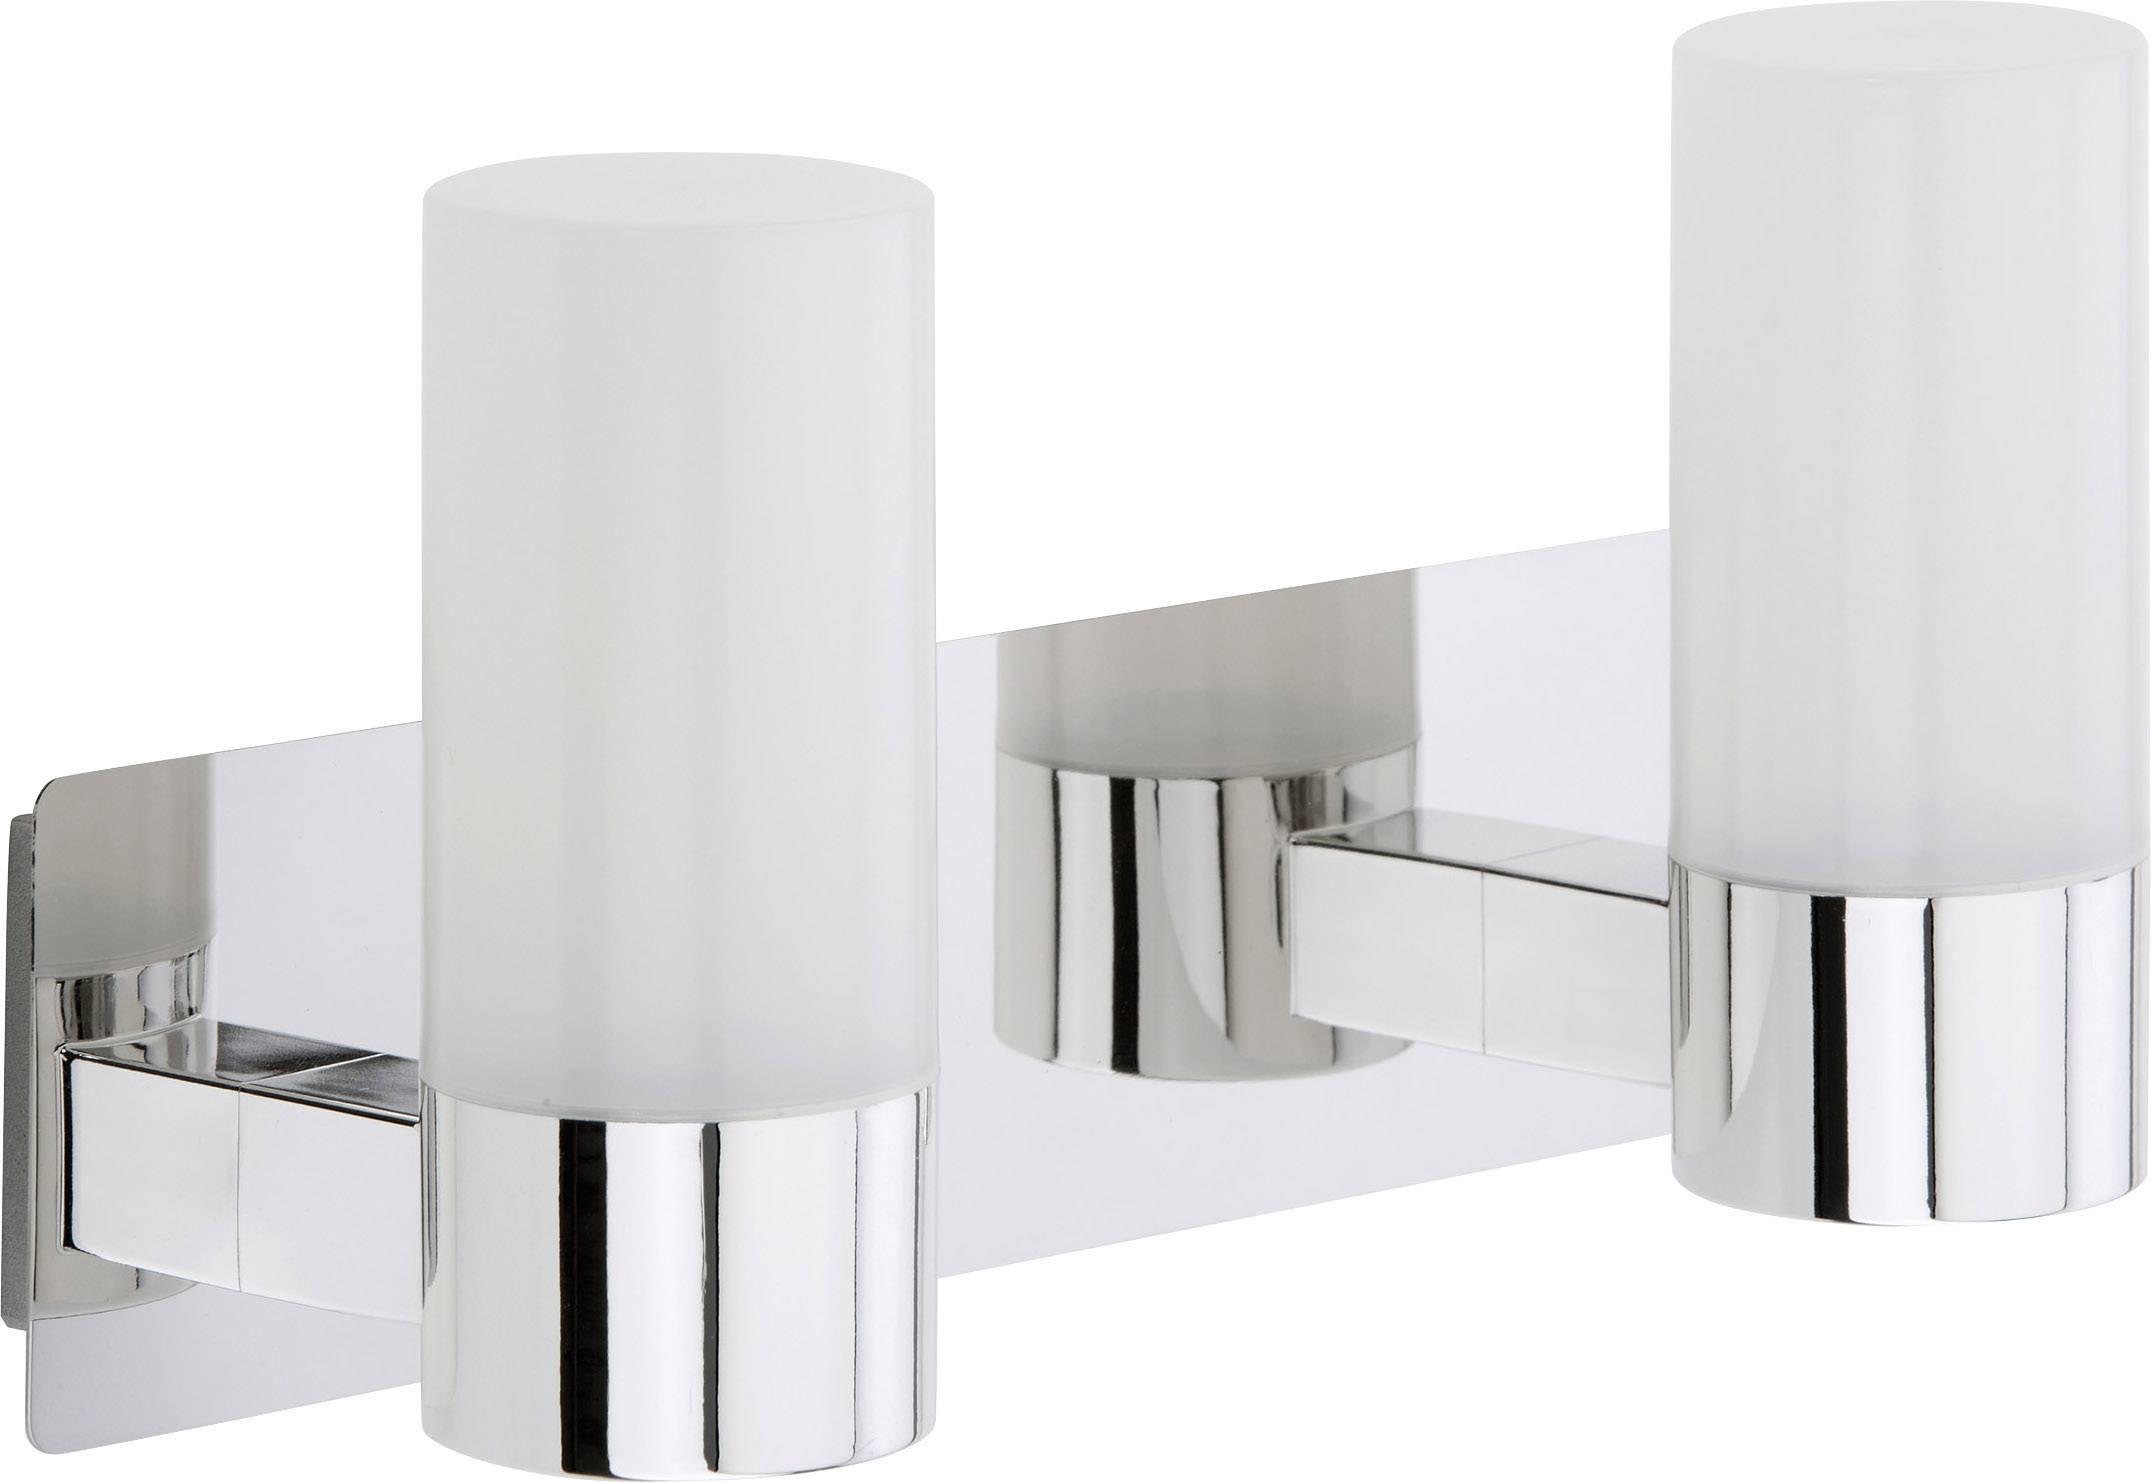 Badkamer Design Wandlamp : Led badkamer wandlamp w warm wit briloner splash chroom